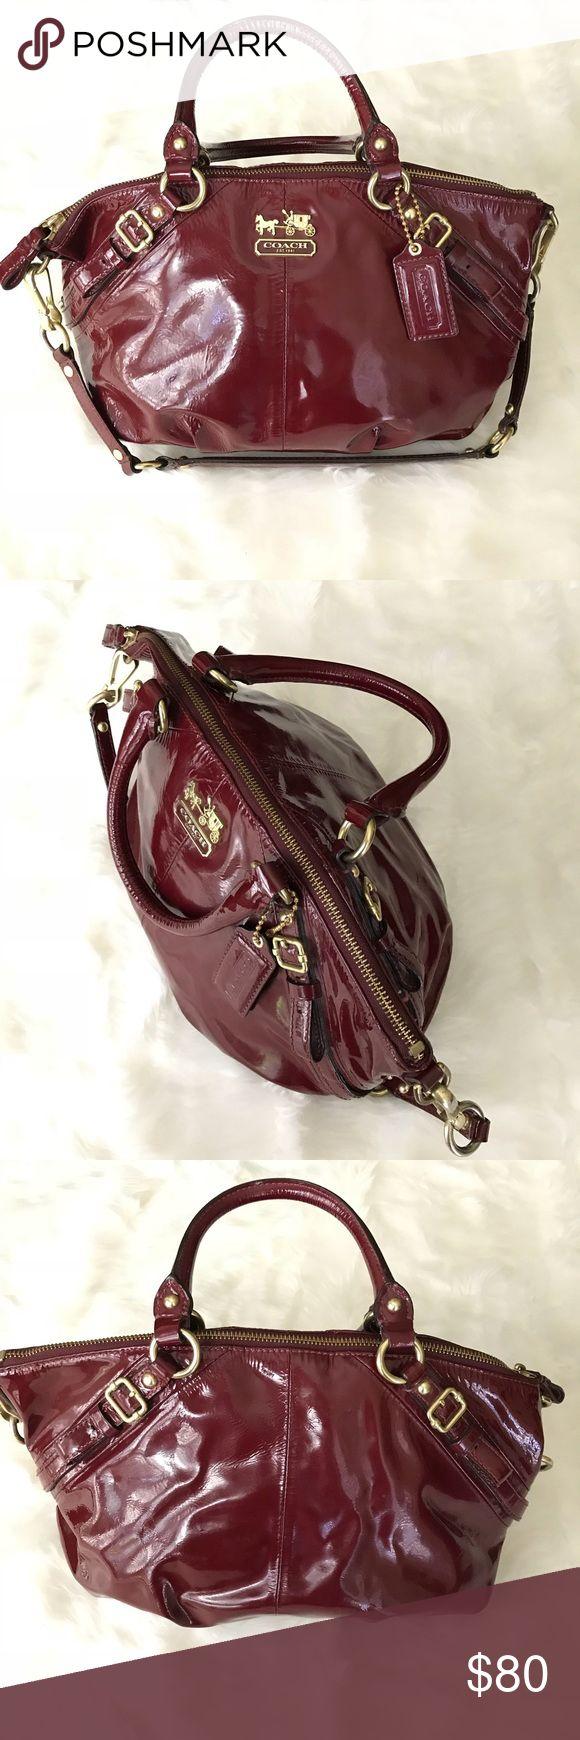 Coach Sophia Madison Crimson Patent Leather Bag Pinterest Bags And Satchels